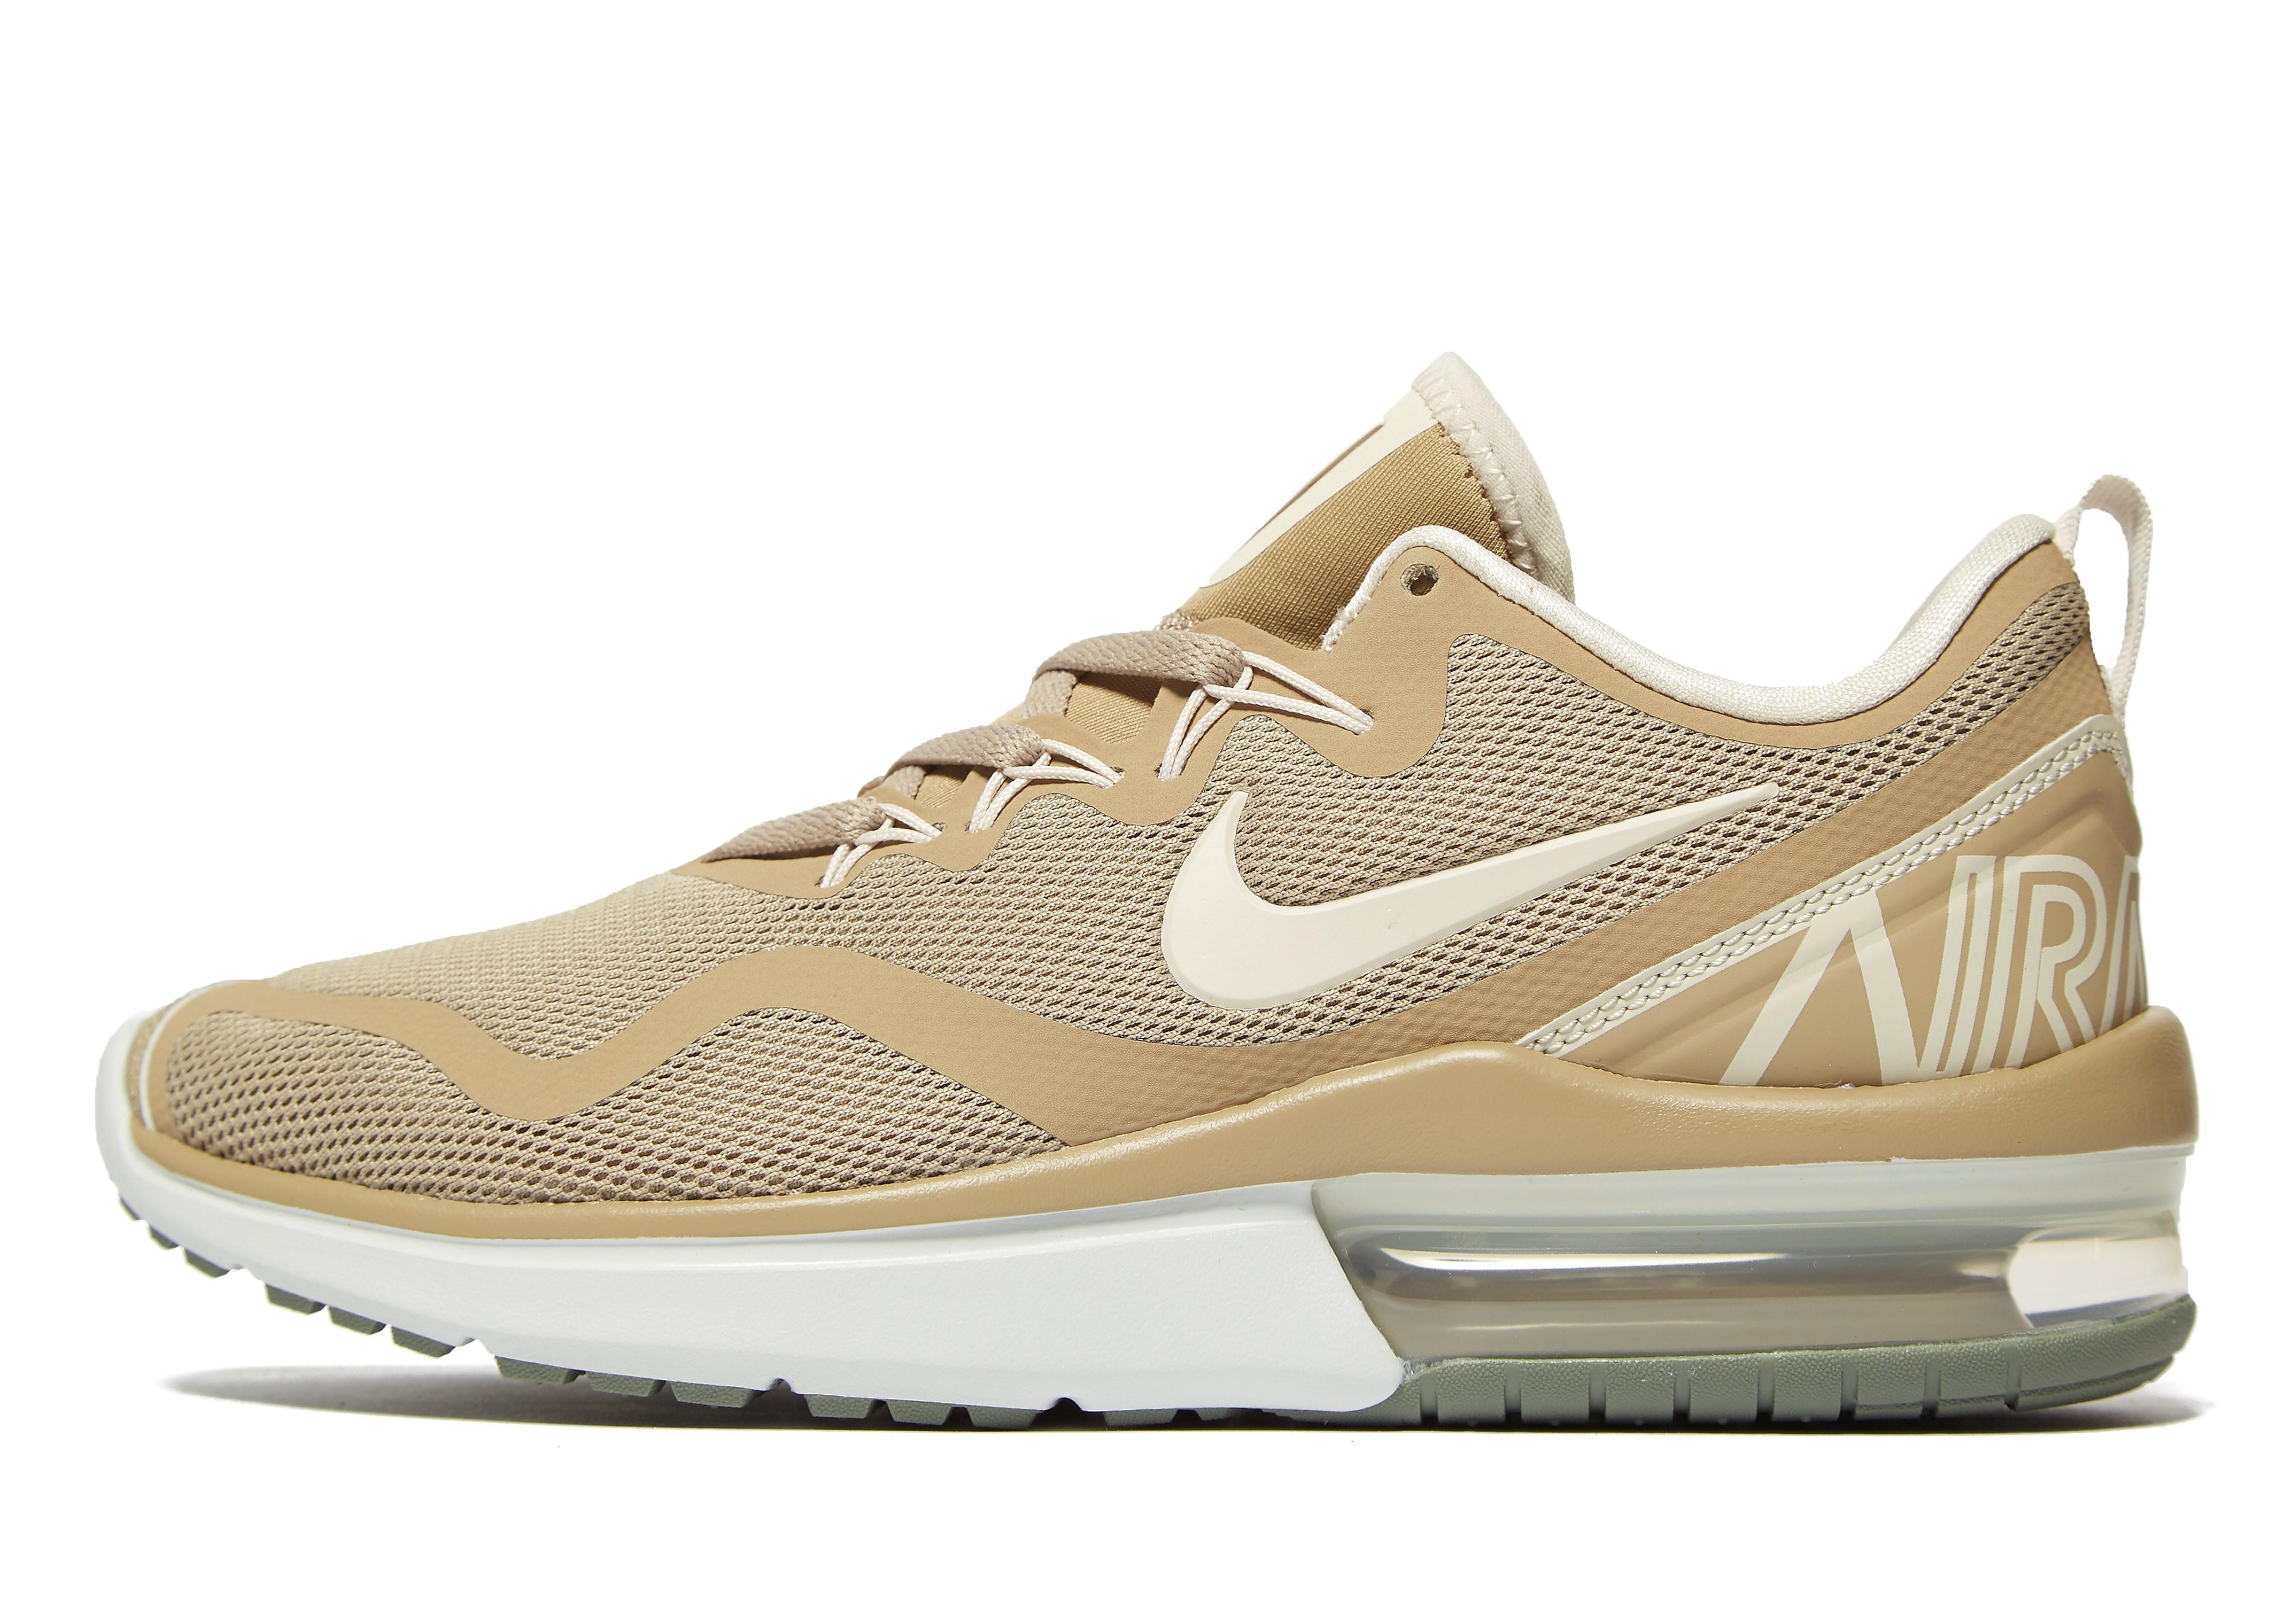 Nike Air Max Fury Dames